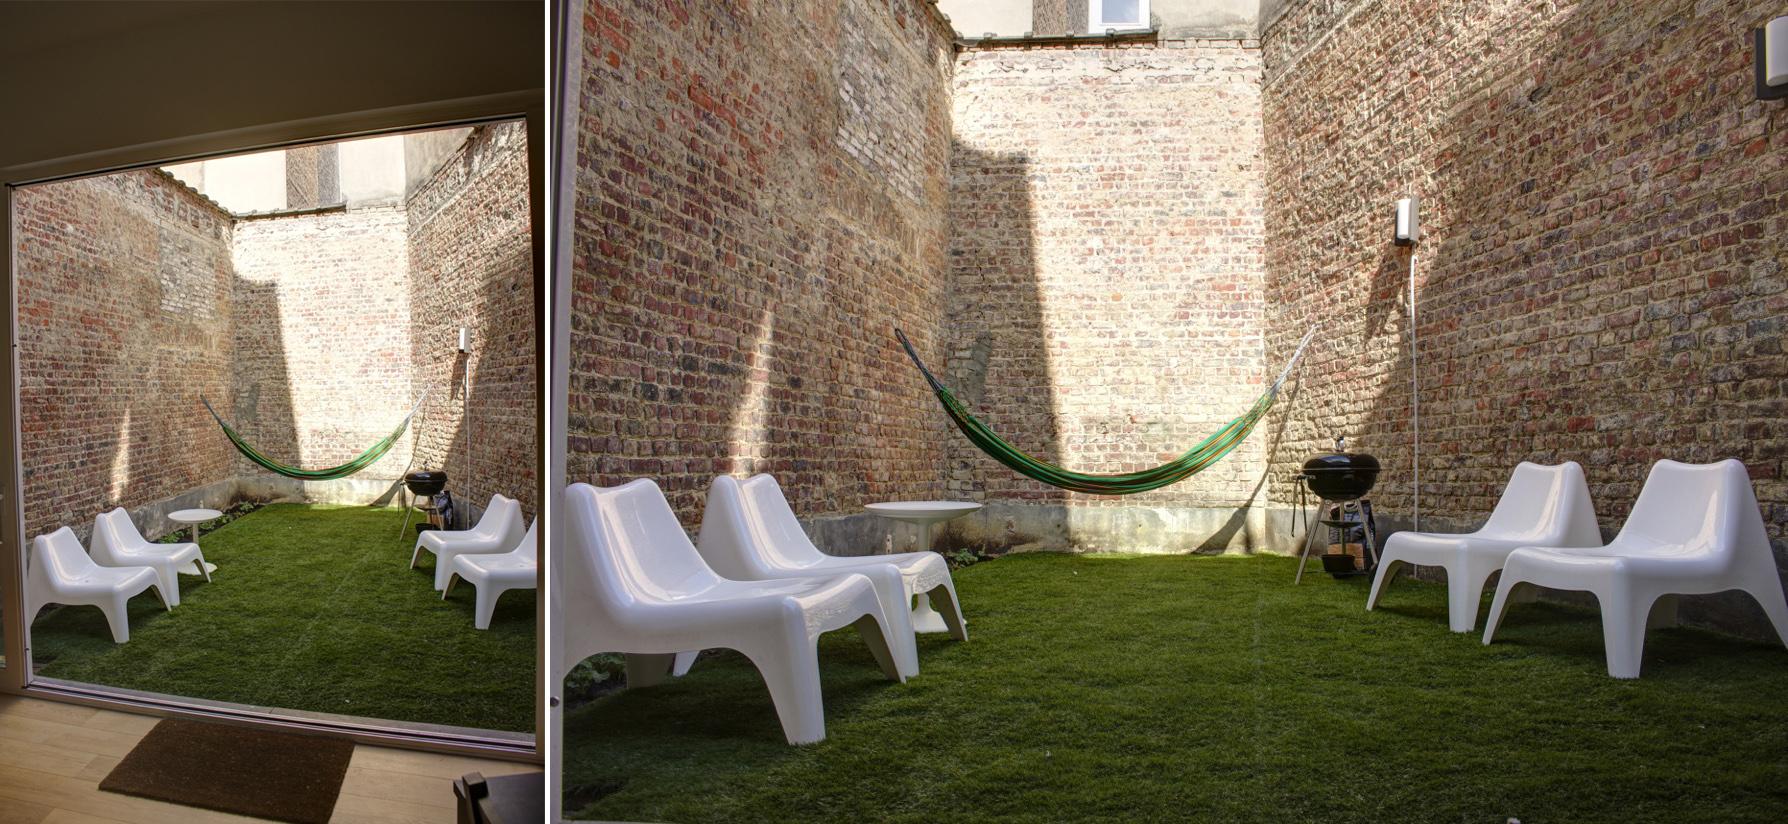 promo gazon synthetique gazon artificiel with promo gazon synthetique promo gazon synthetique. Black Bedroom Furniture Sets. Home Design Ideas